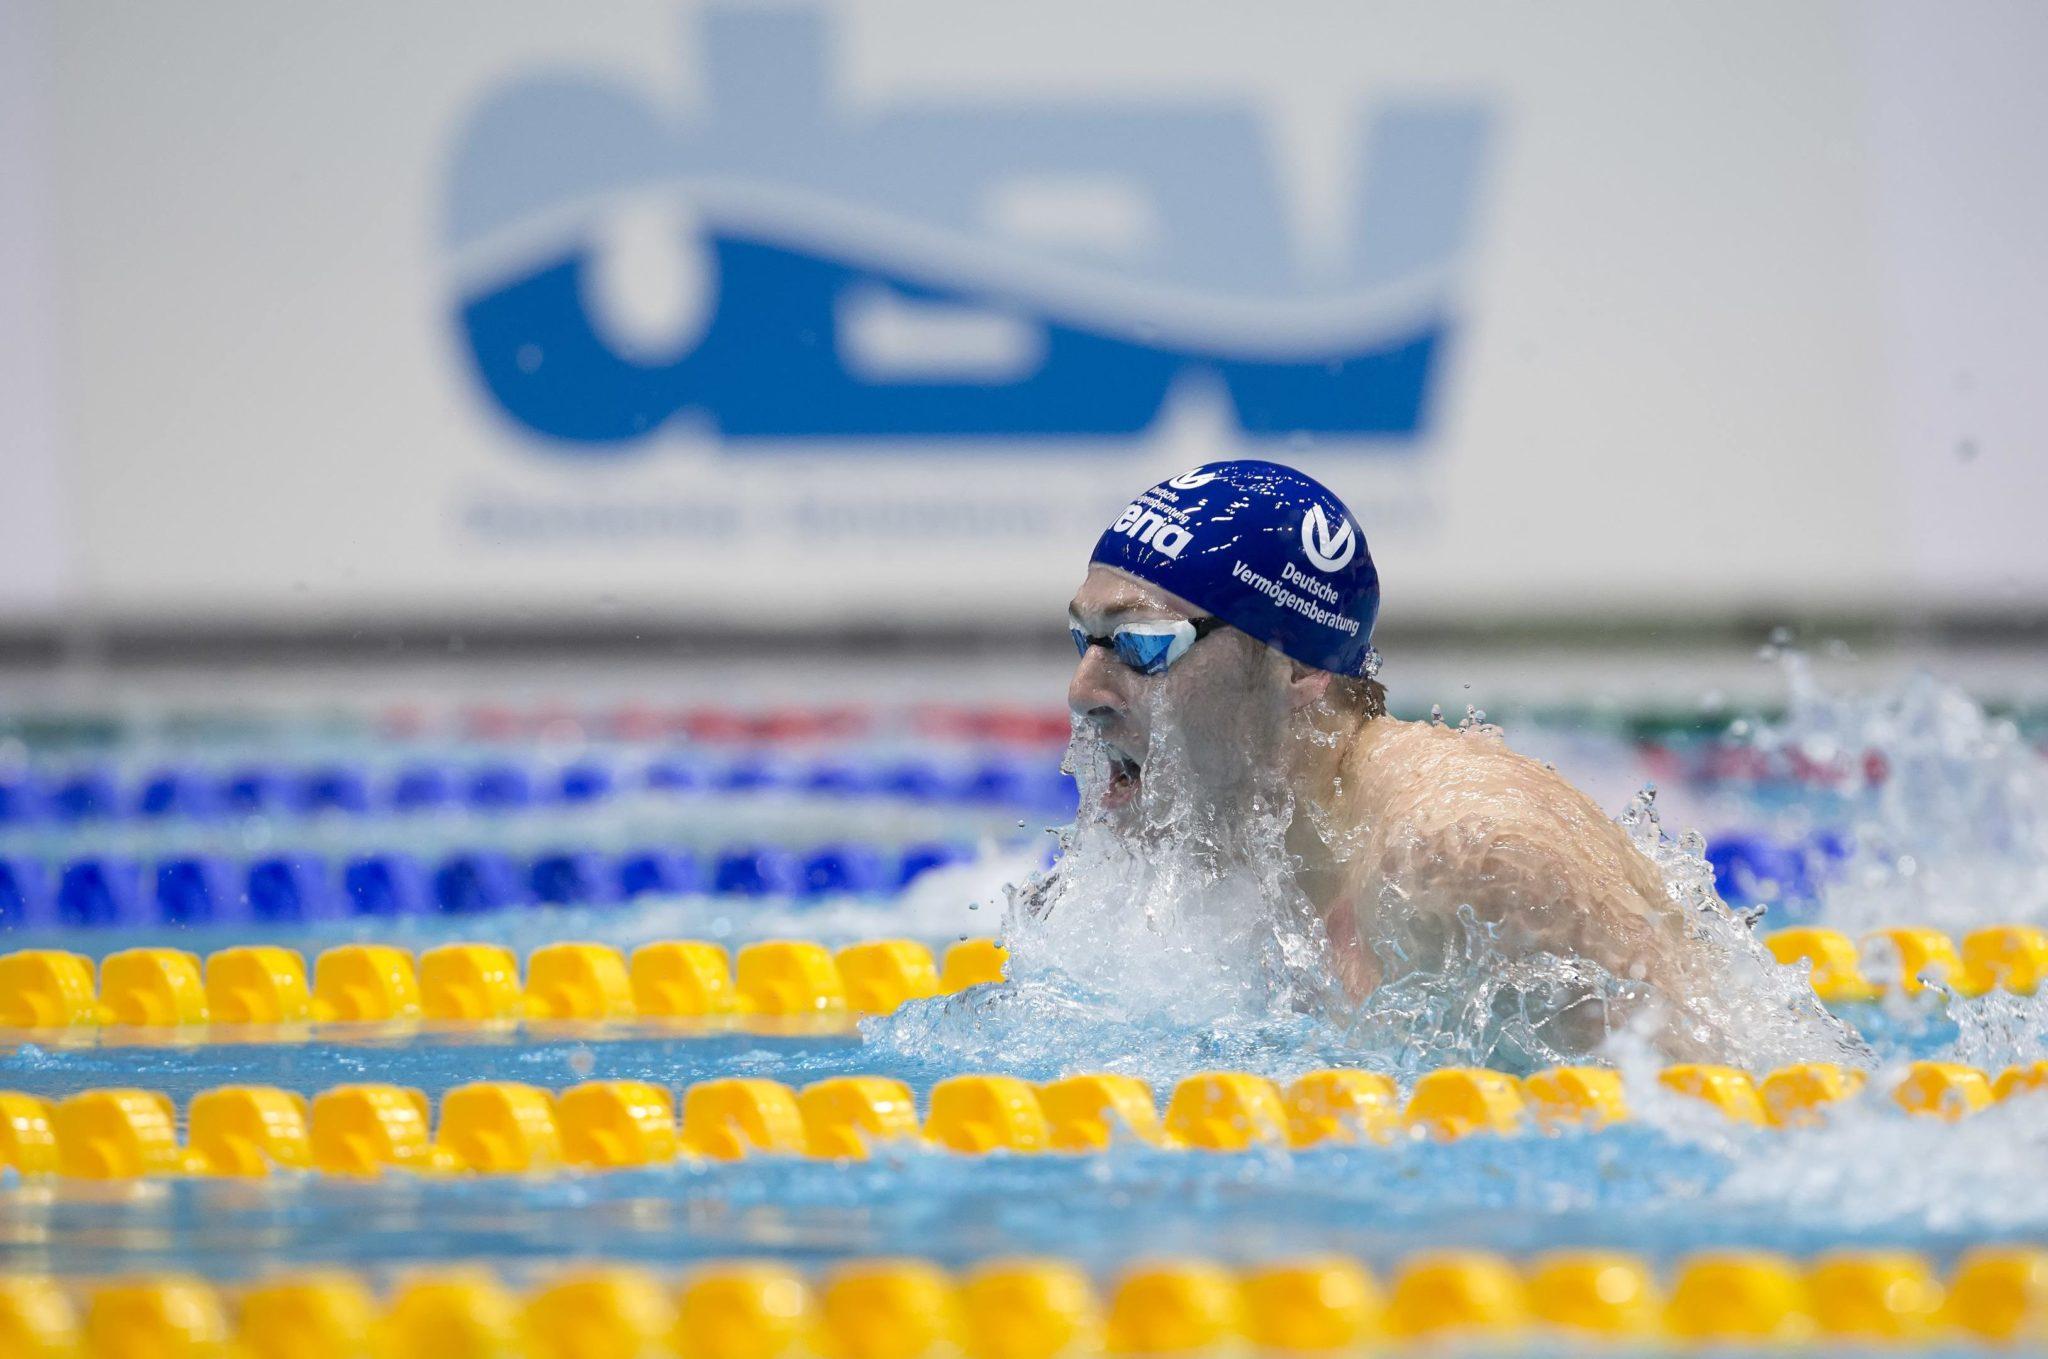 Darmstadt Swimming Pool dms 2 bundesliga aufsteiger hannover darmstadt potsdam